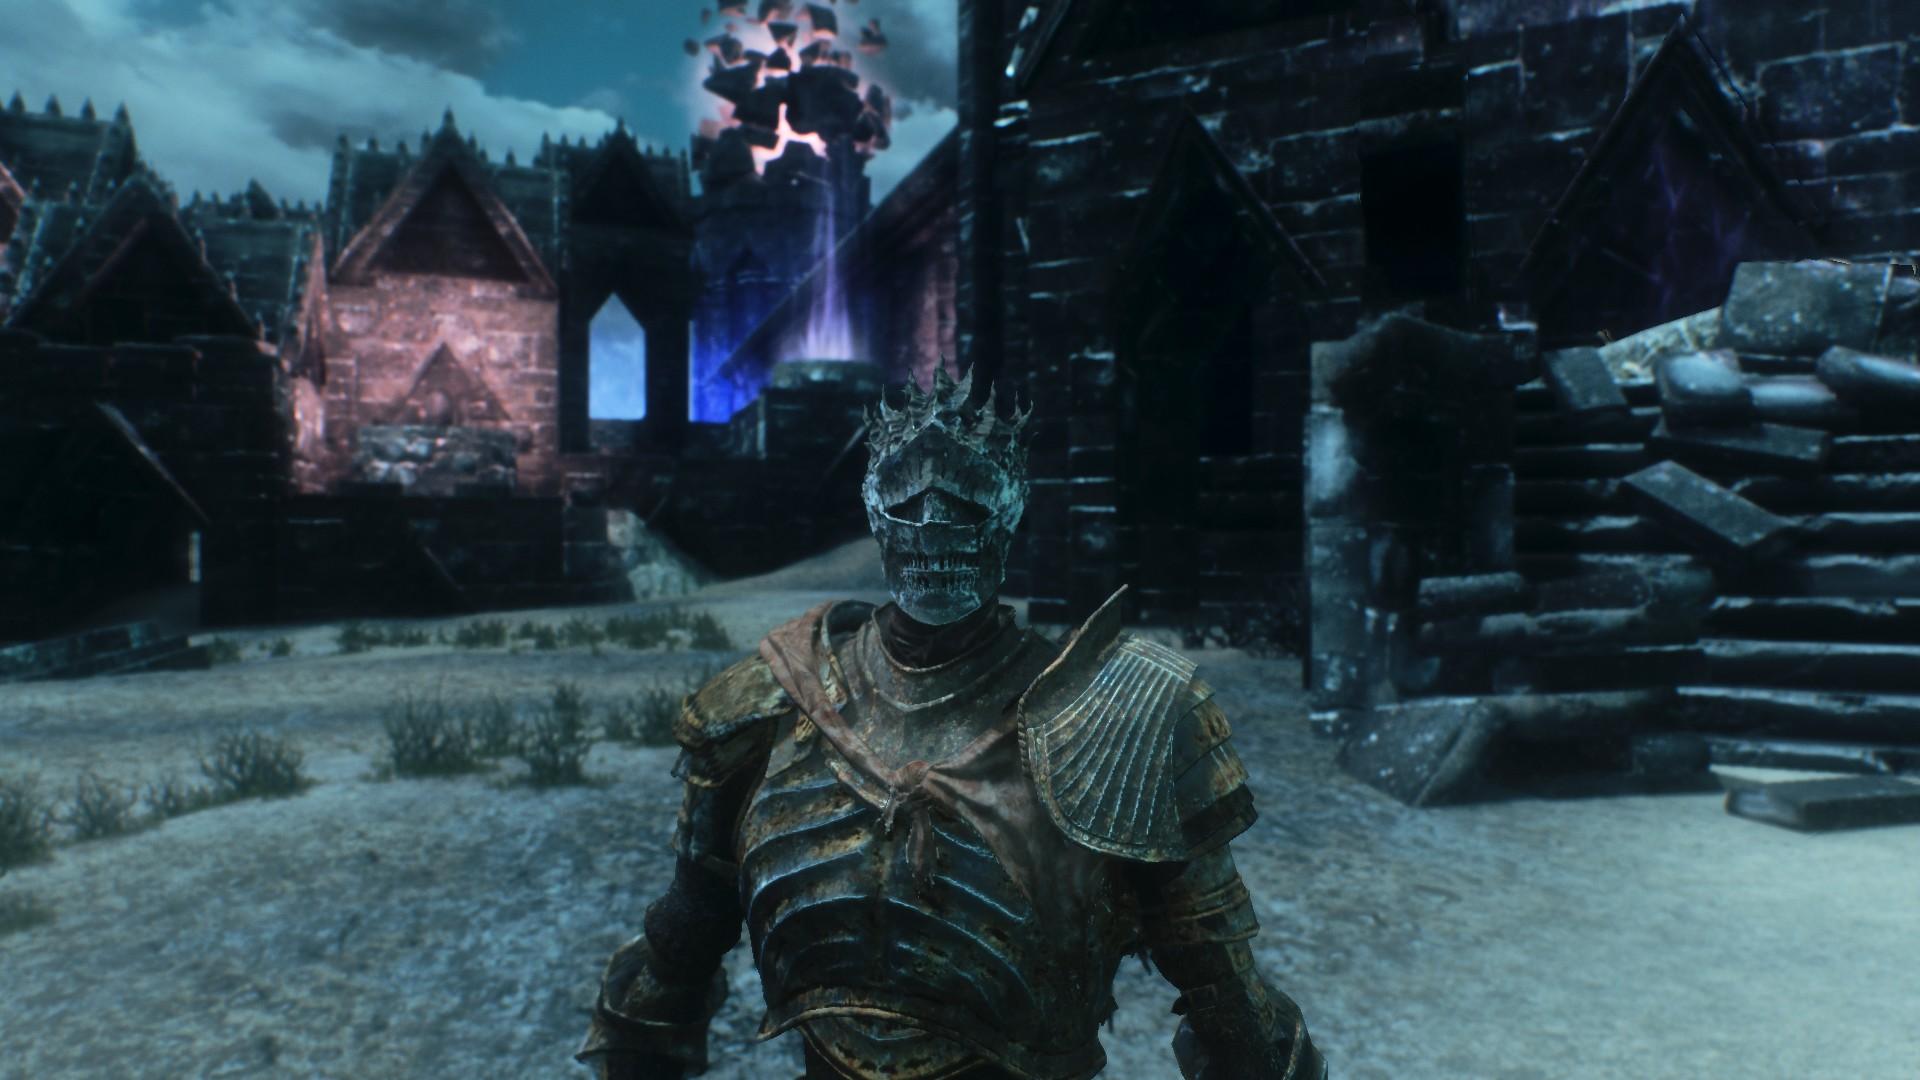 Steam Workshop :: Dark Souls III Soul of Cinder Armor and Weapons